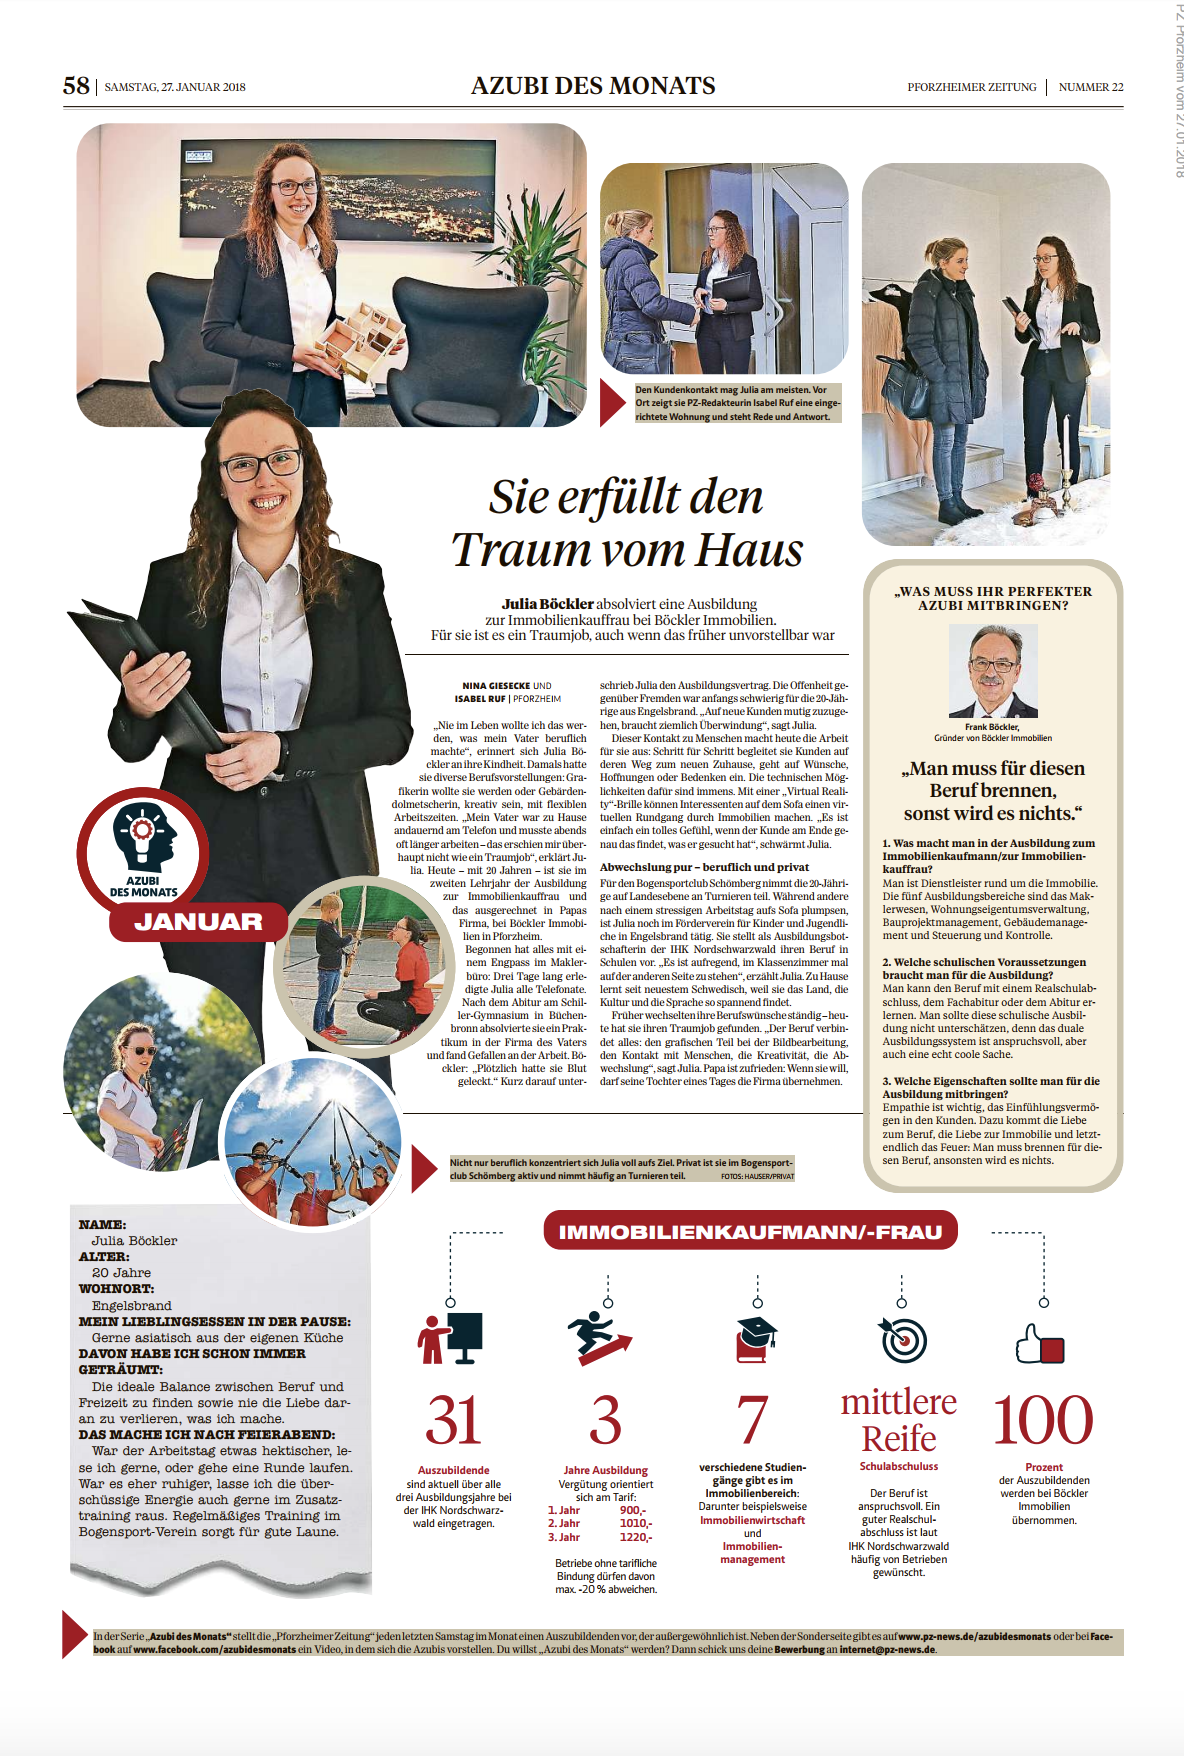 Julia Böckler von Böckler Immobilien in Pforzheim ist Azubi des Monats Januar Pforzheimer-Zeitung